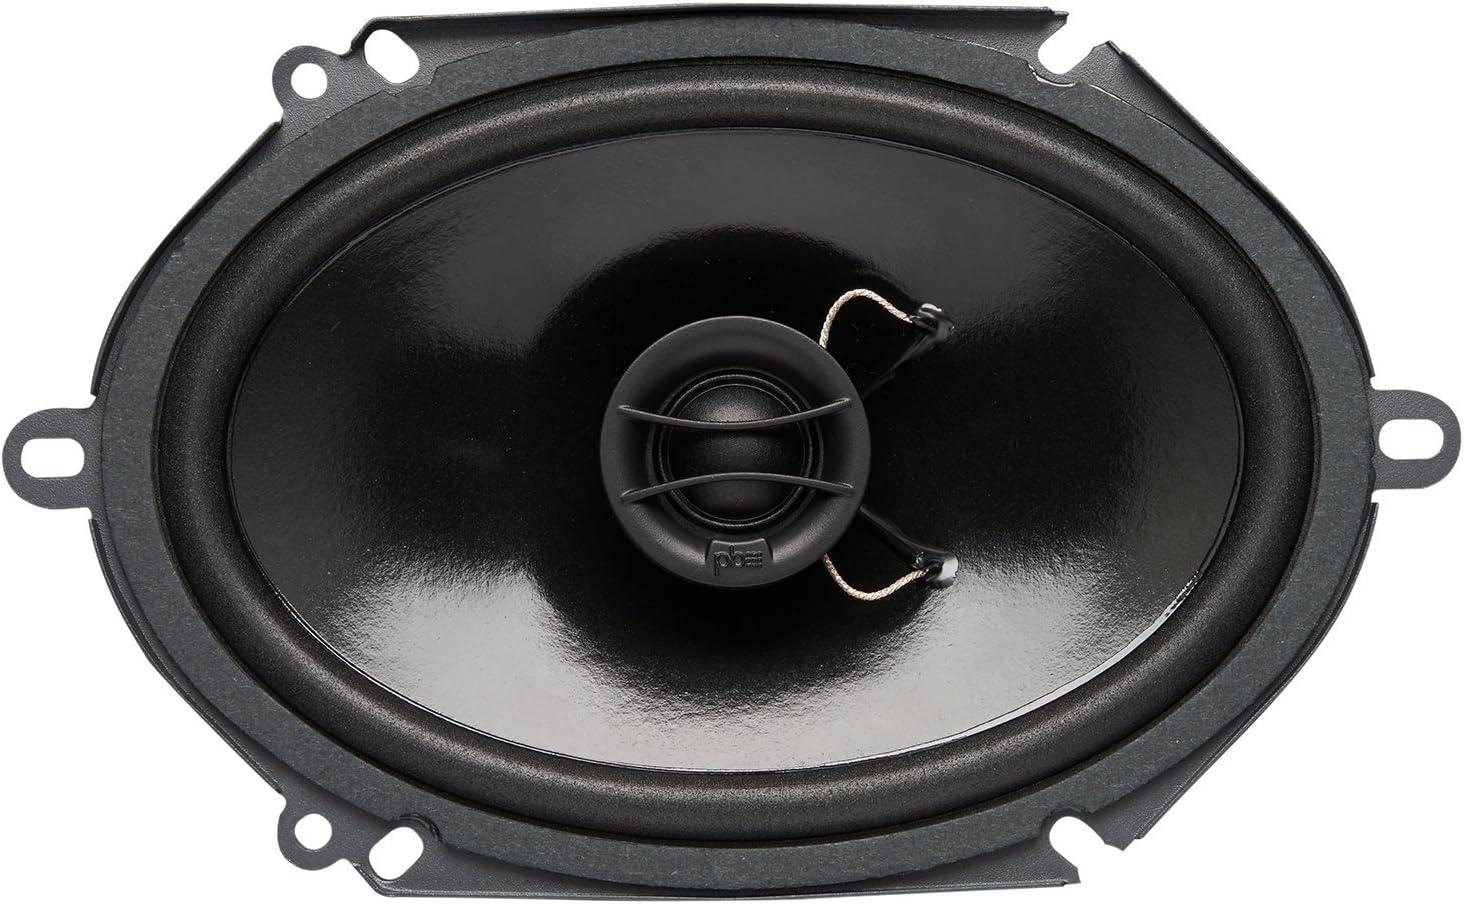 Set of 2 Powerbass S-4002 4 Coaxial OEM Speakers S4002